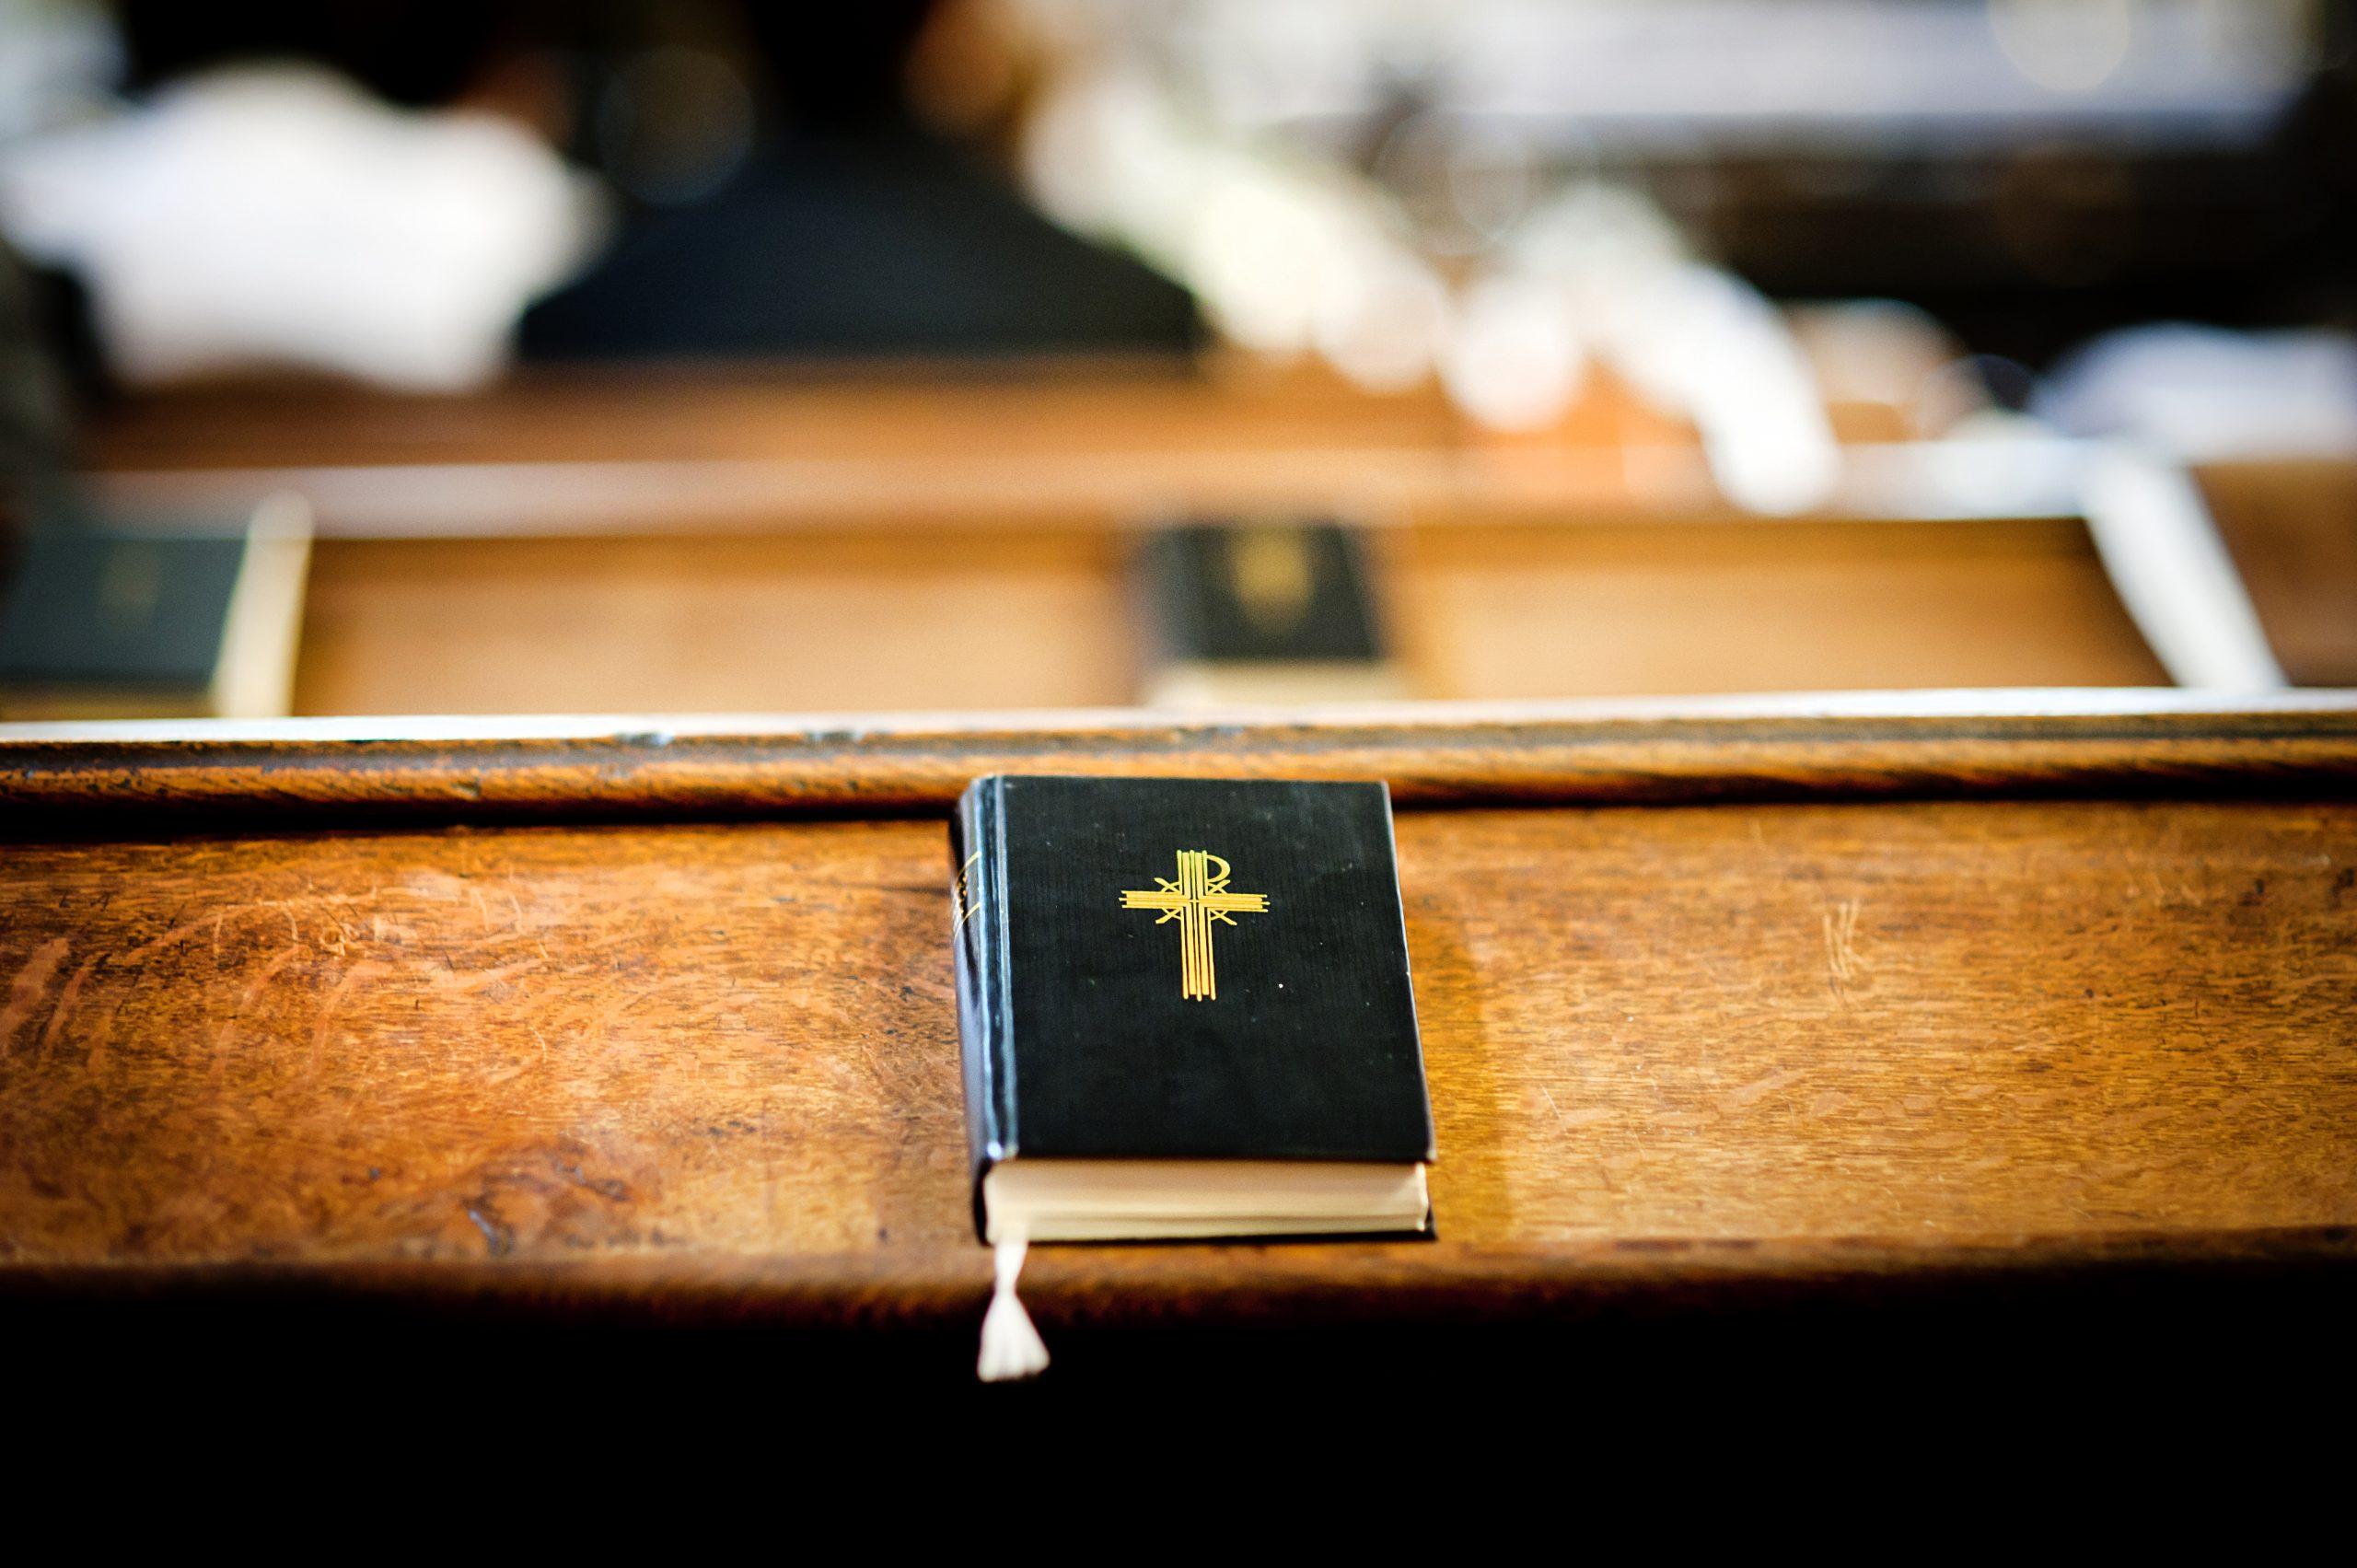 Bible on church pews